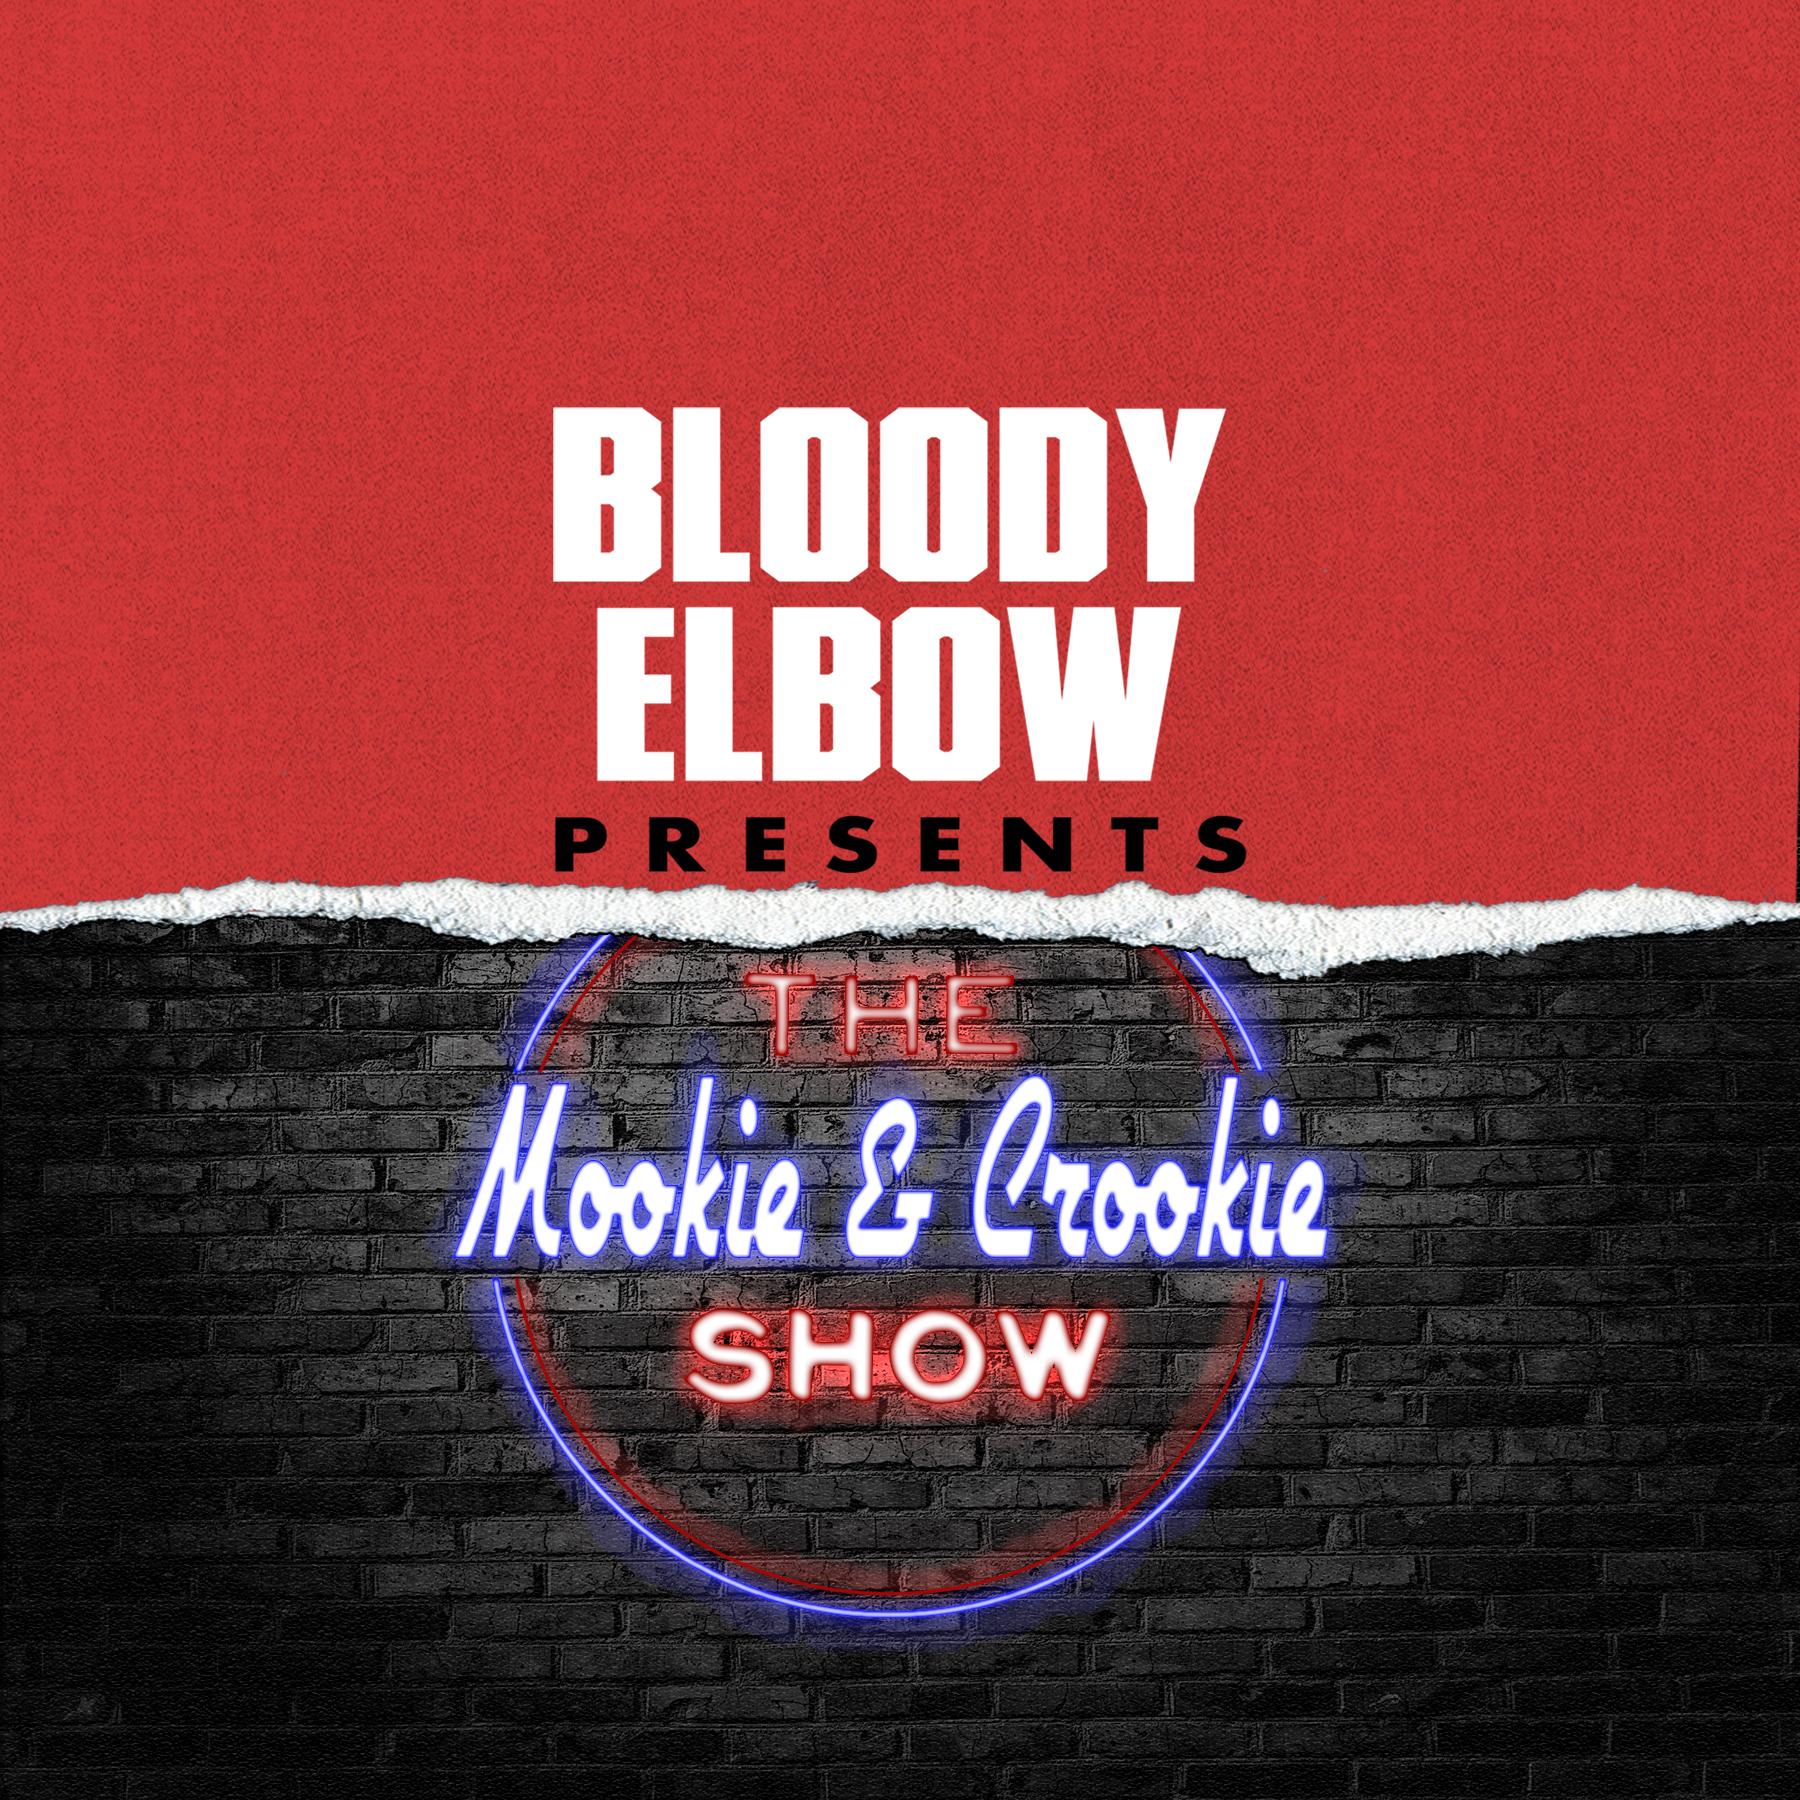 MNC, Mookie & Crookie Show, UFC Podcast, MMA Podcast, UFC News, MMA News, Boxing, Combat Sports,